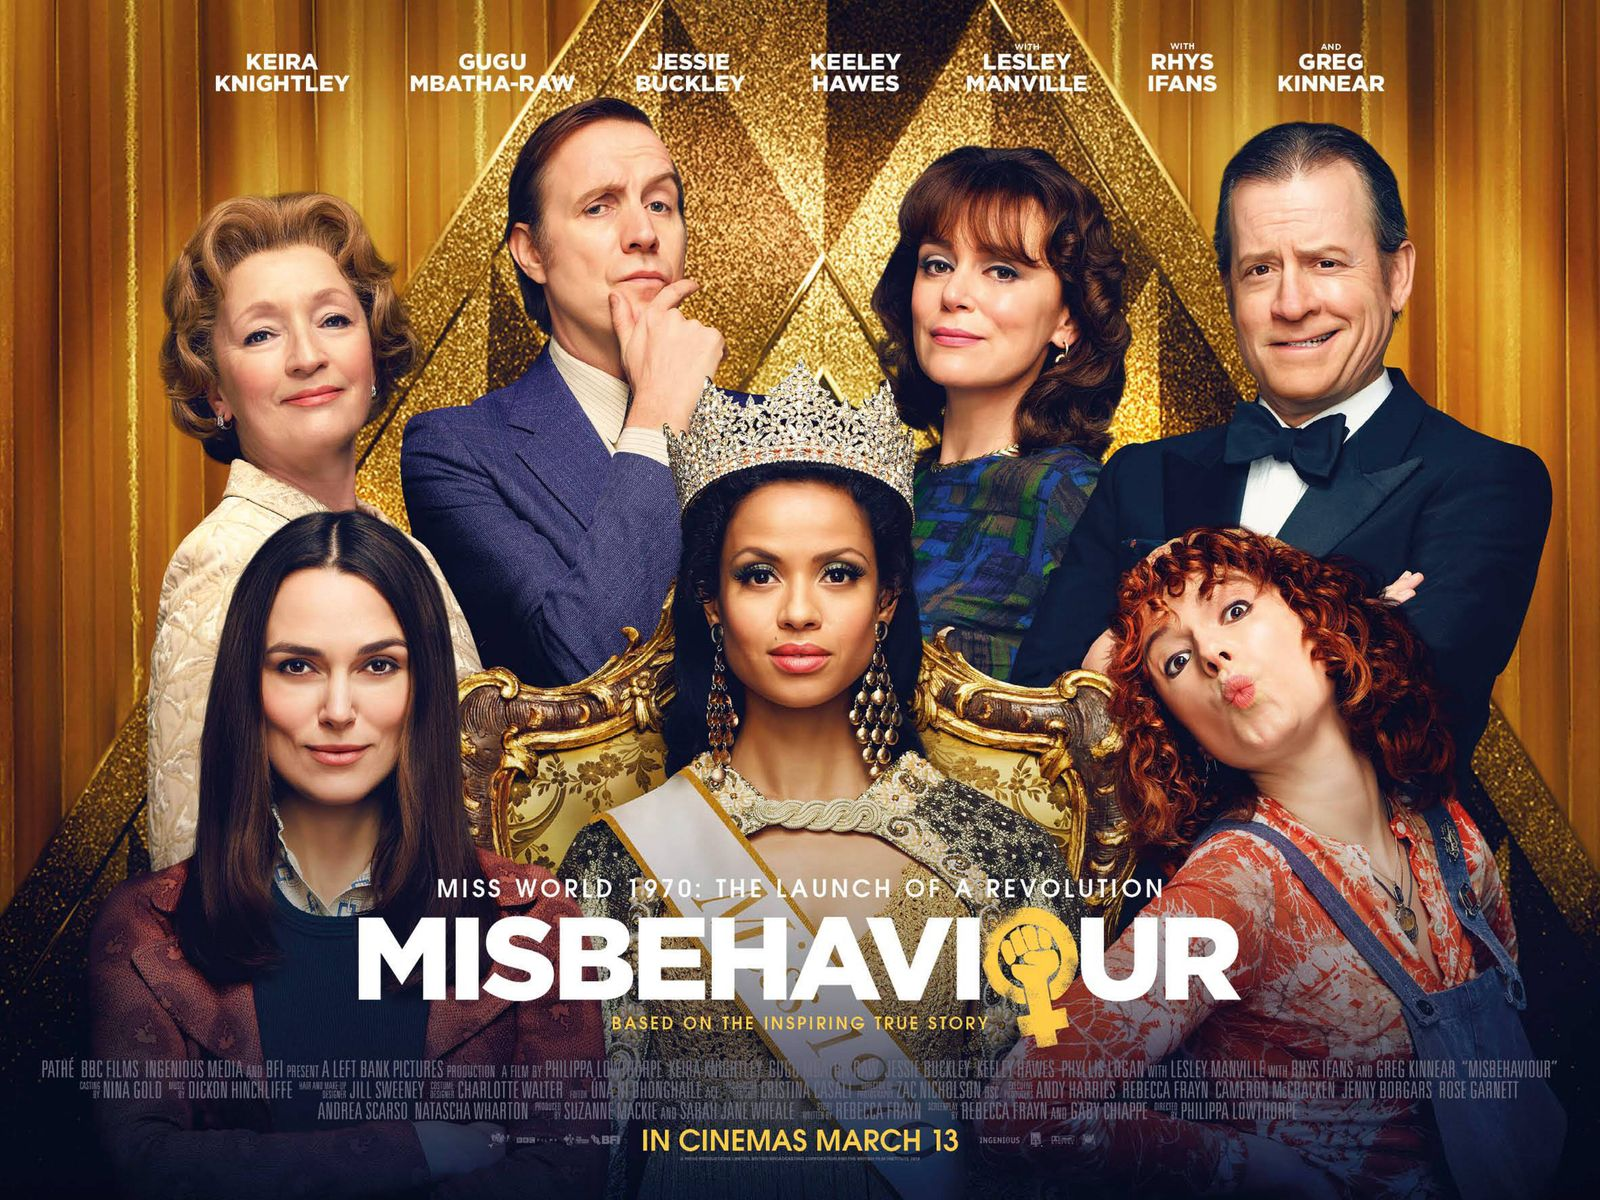 MISBEHAVIOUR 2020 de Philippa Lowthorpe Keira Knightley Gugu Mbatha-Raw Greg Kinnear Jessie Buckley Rhys Ifans. Pathe -